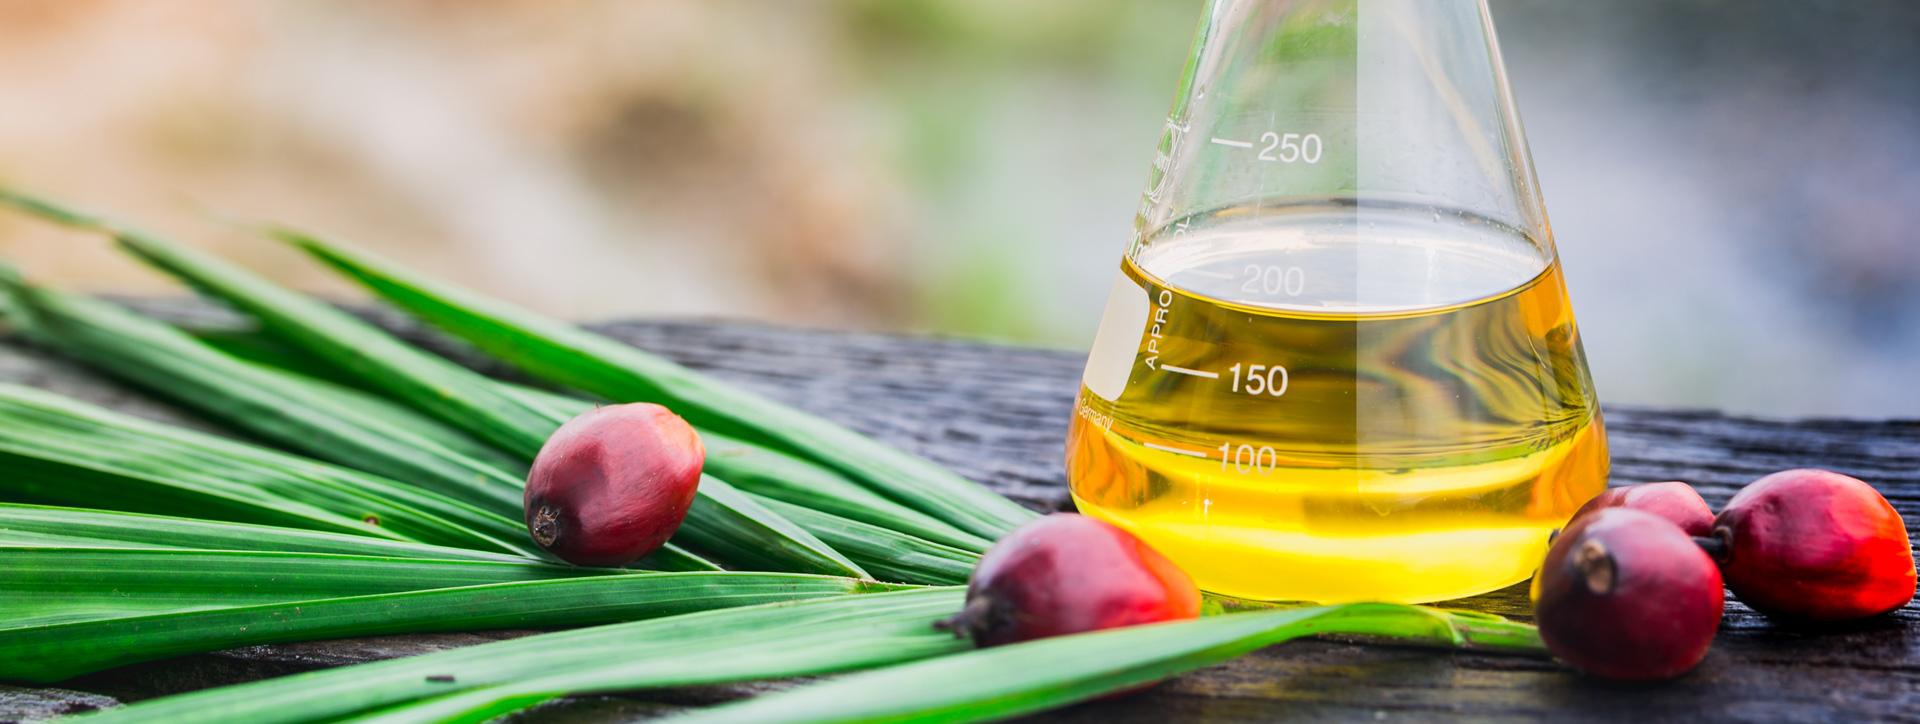 oleo-palme-biodiesel-banner